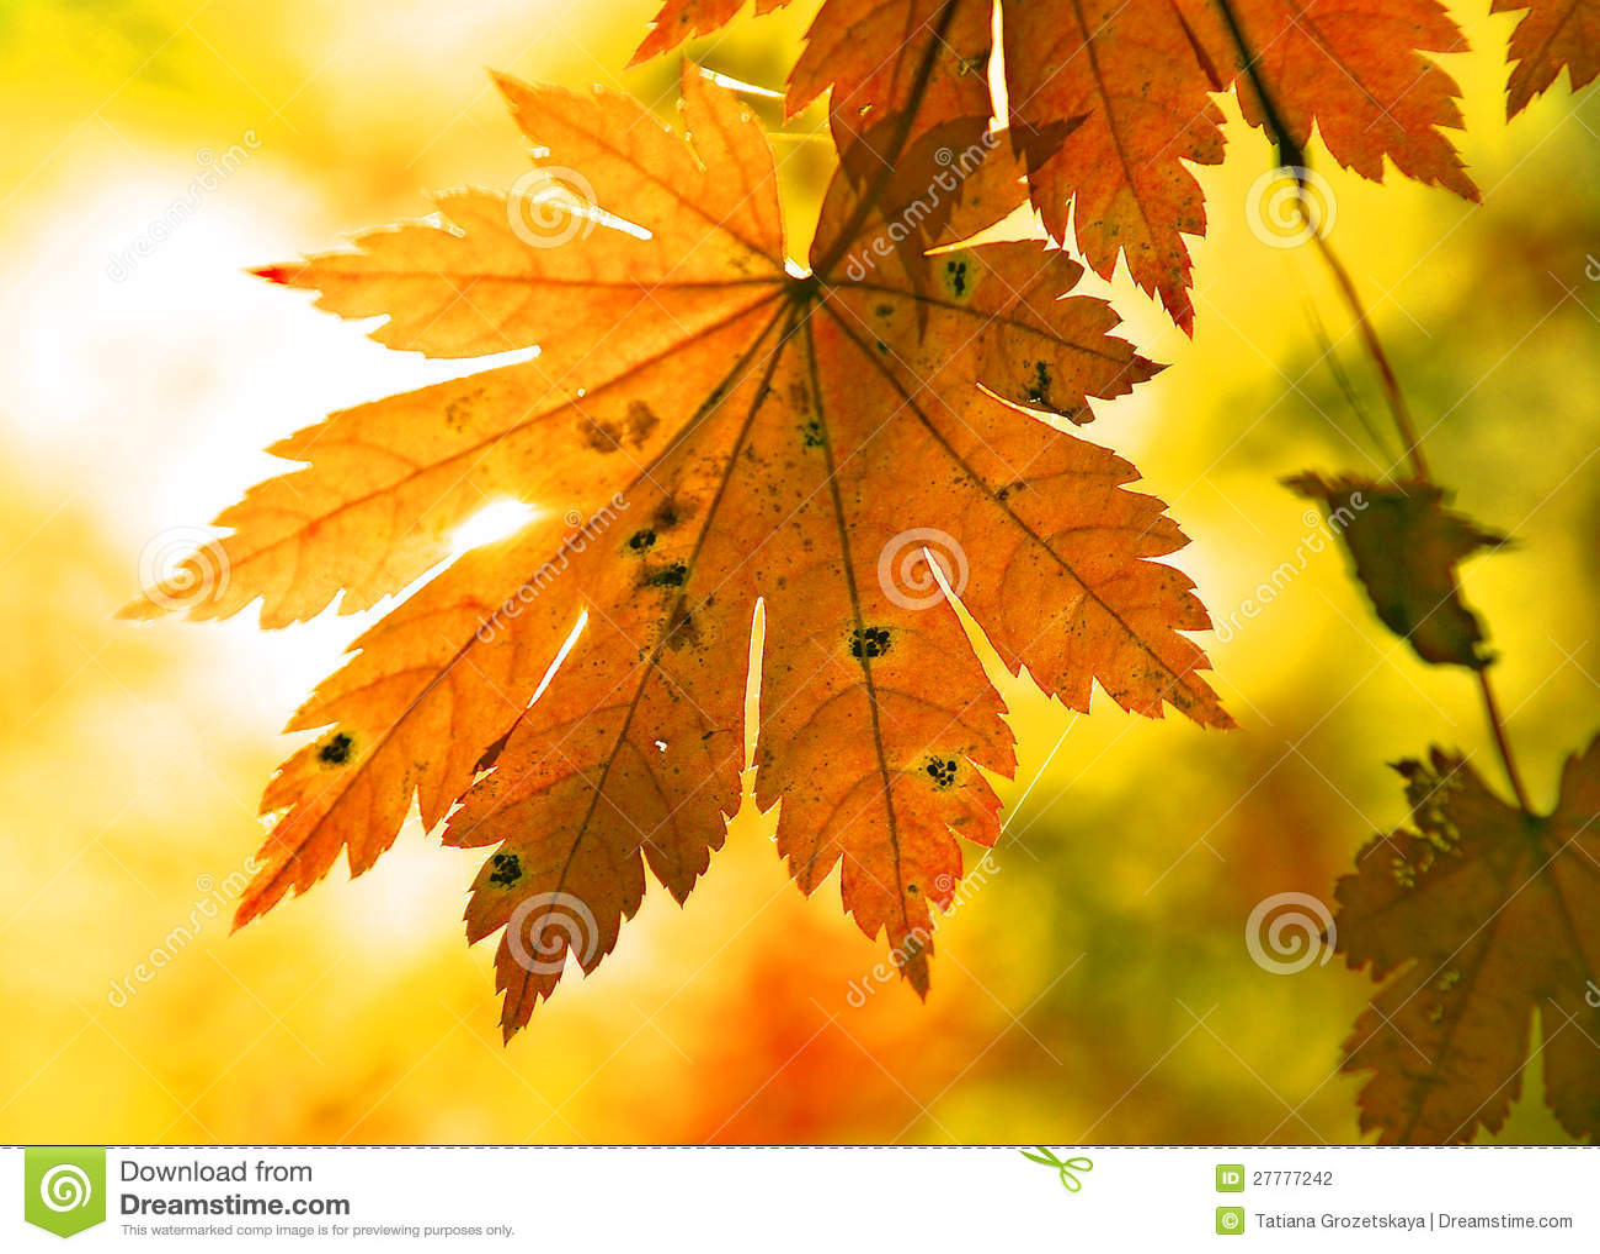 Herfst esdoornblad en zonnestraal